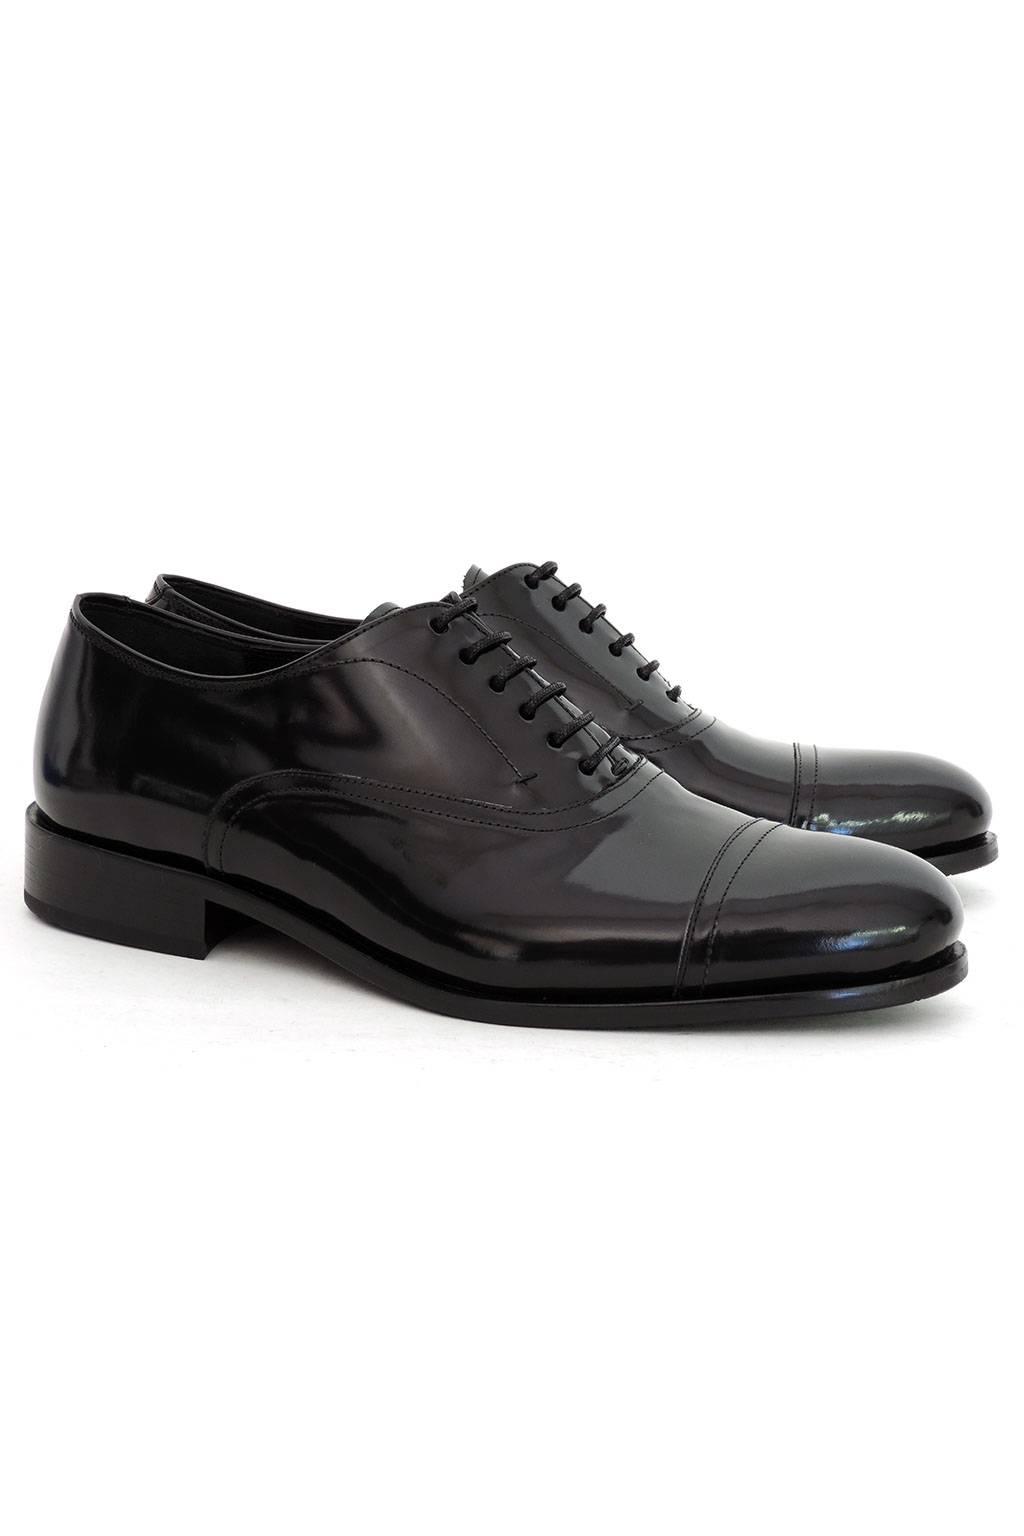 Zapato piel nueva horma italiana